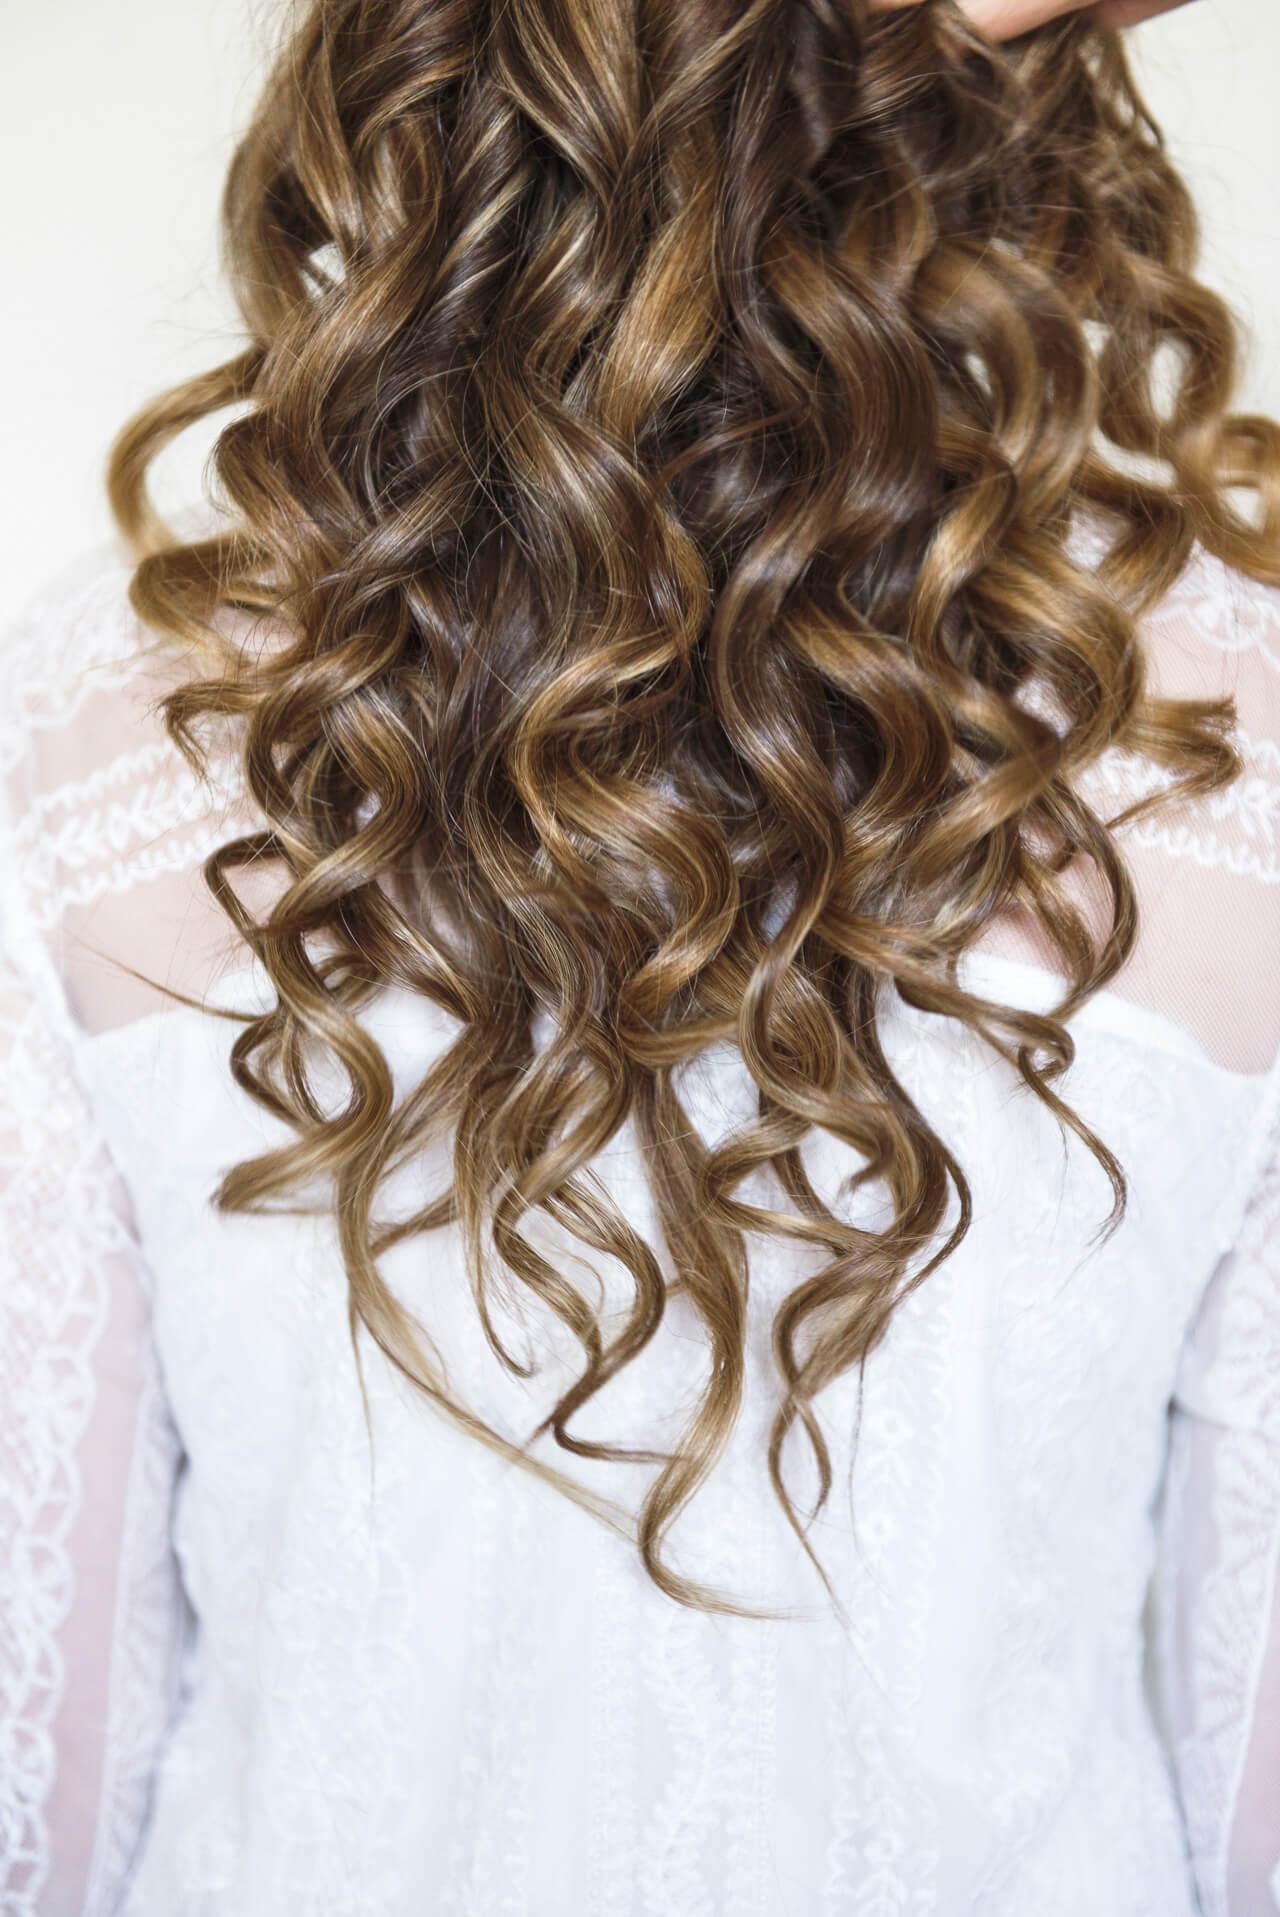 lots of spiral curls